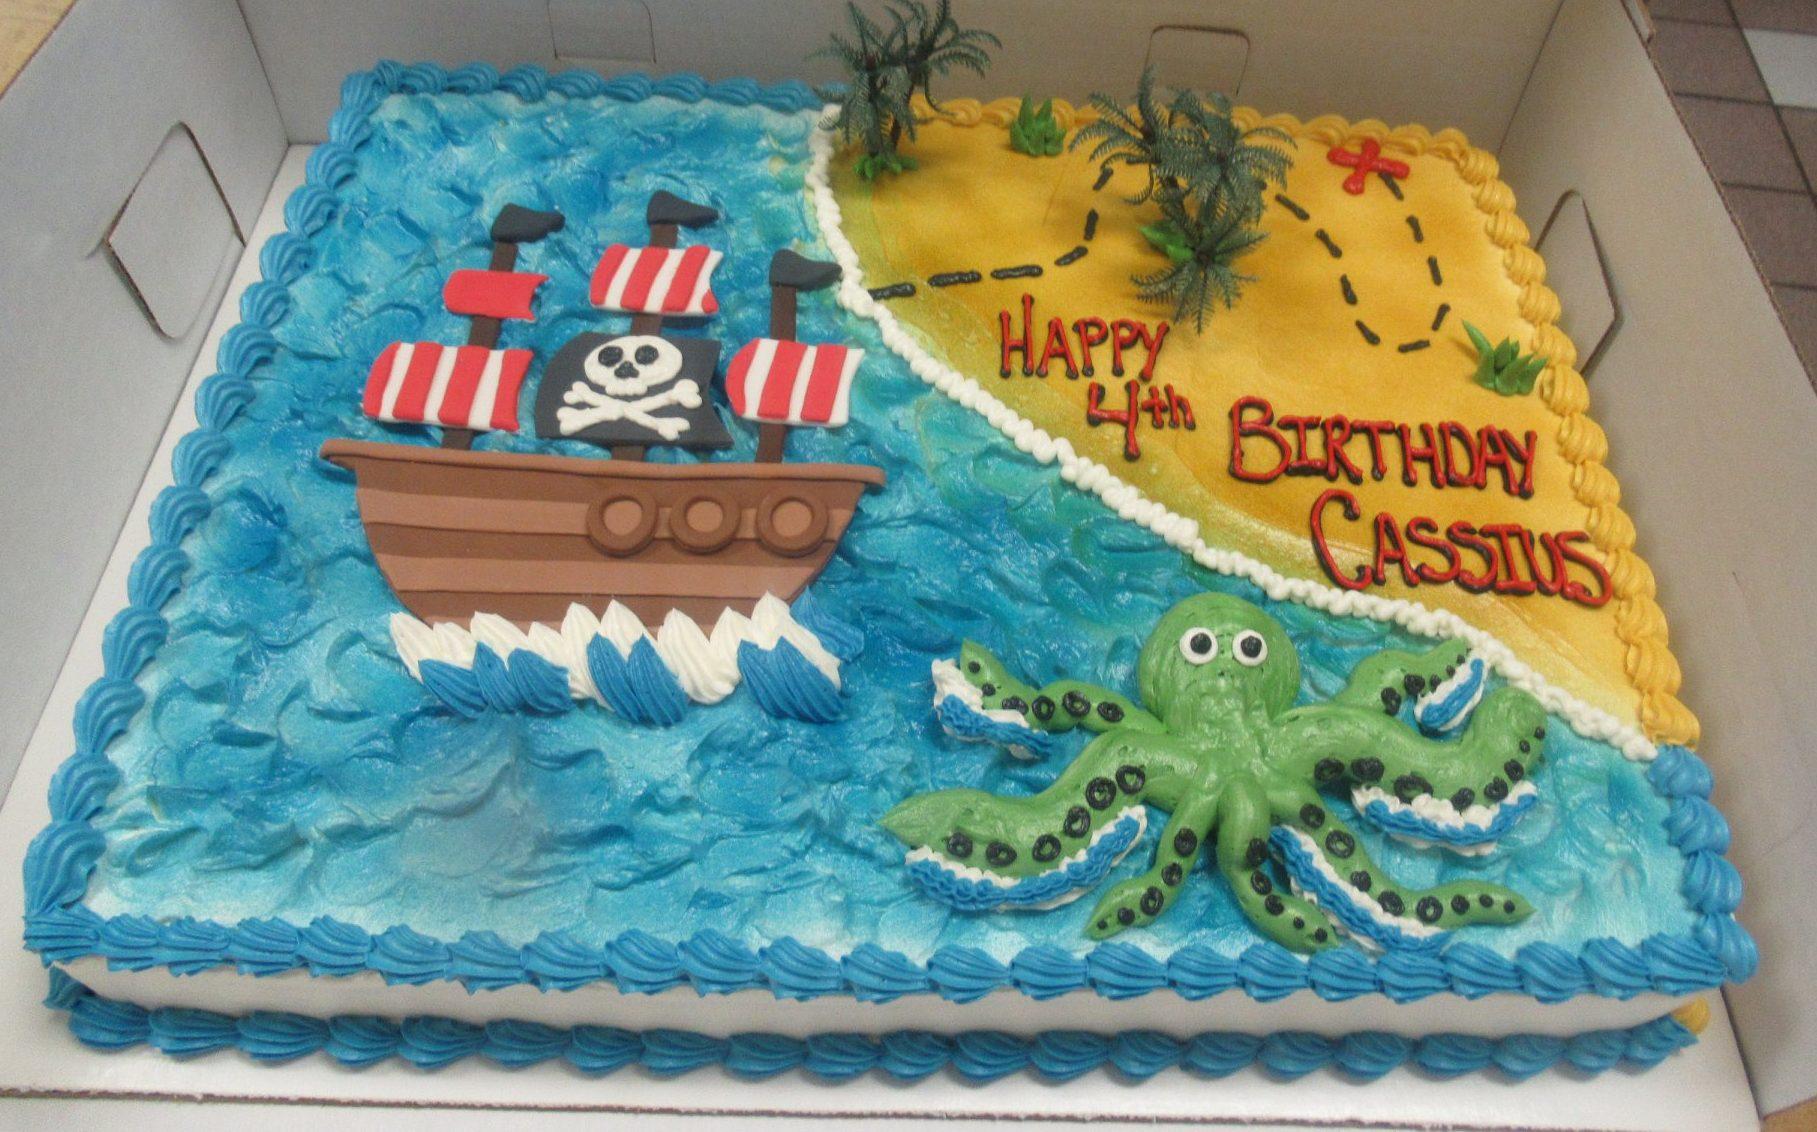 Astounding Pirate Ship Cake Grandmas Country Oven Bake Shoppe Funny Birthday Cards Online Inifofree Goldxyz